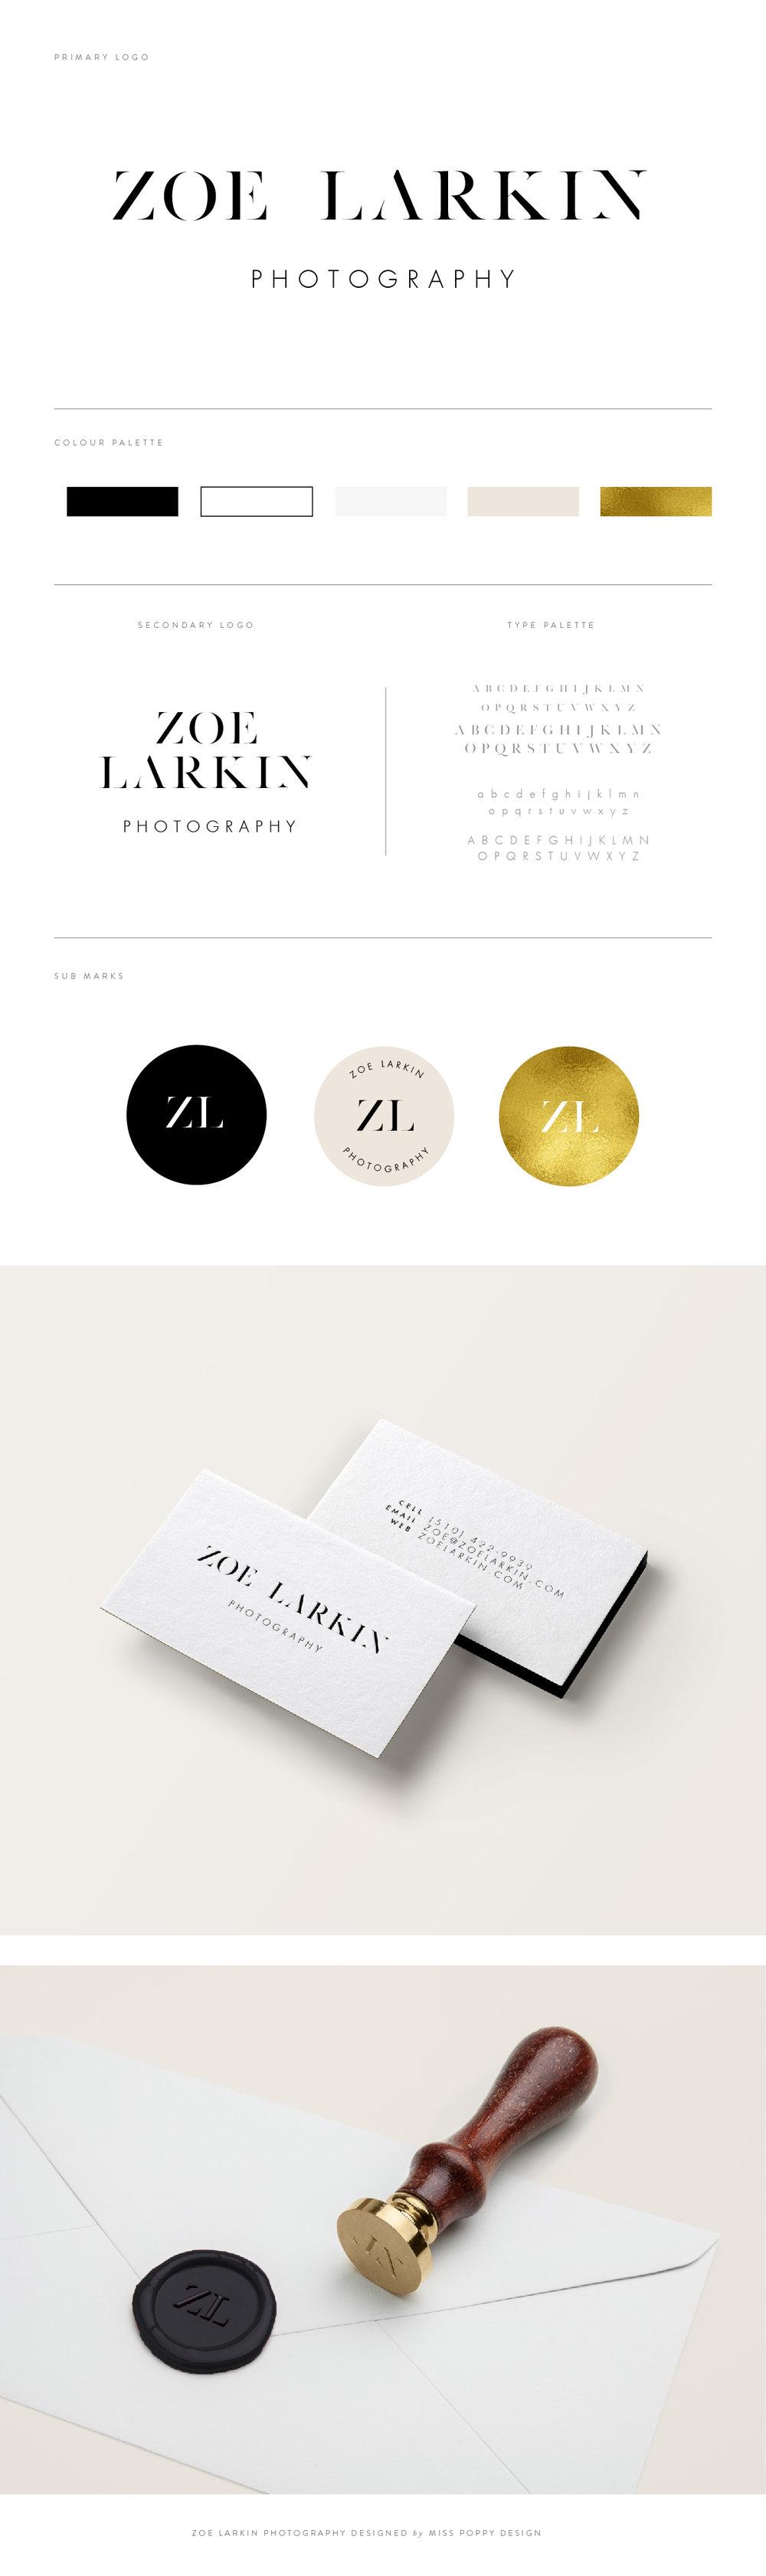 Zoe Larkin Photography: Logo Brand Design by Miss Poppy Design